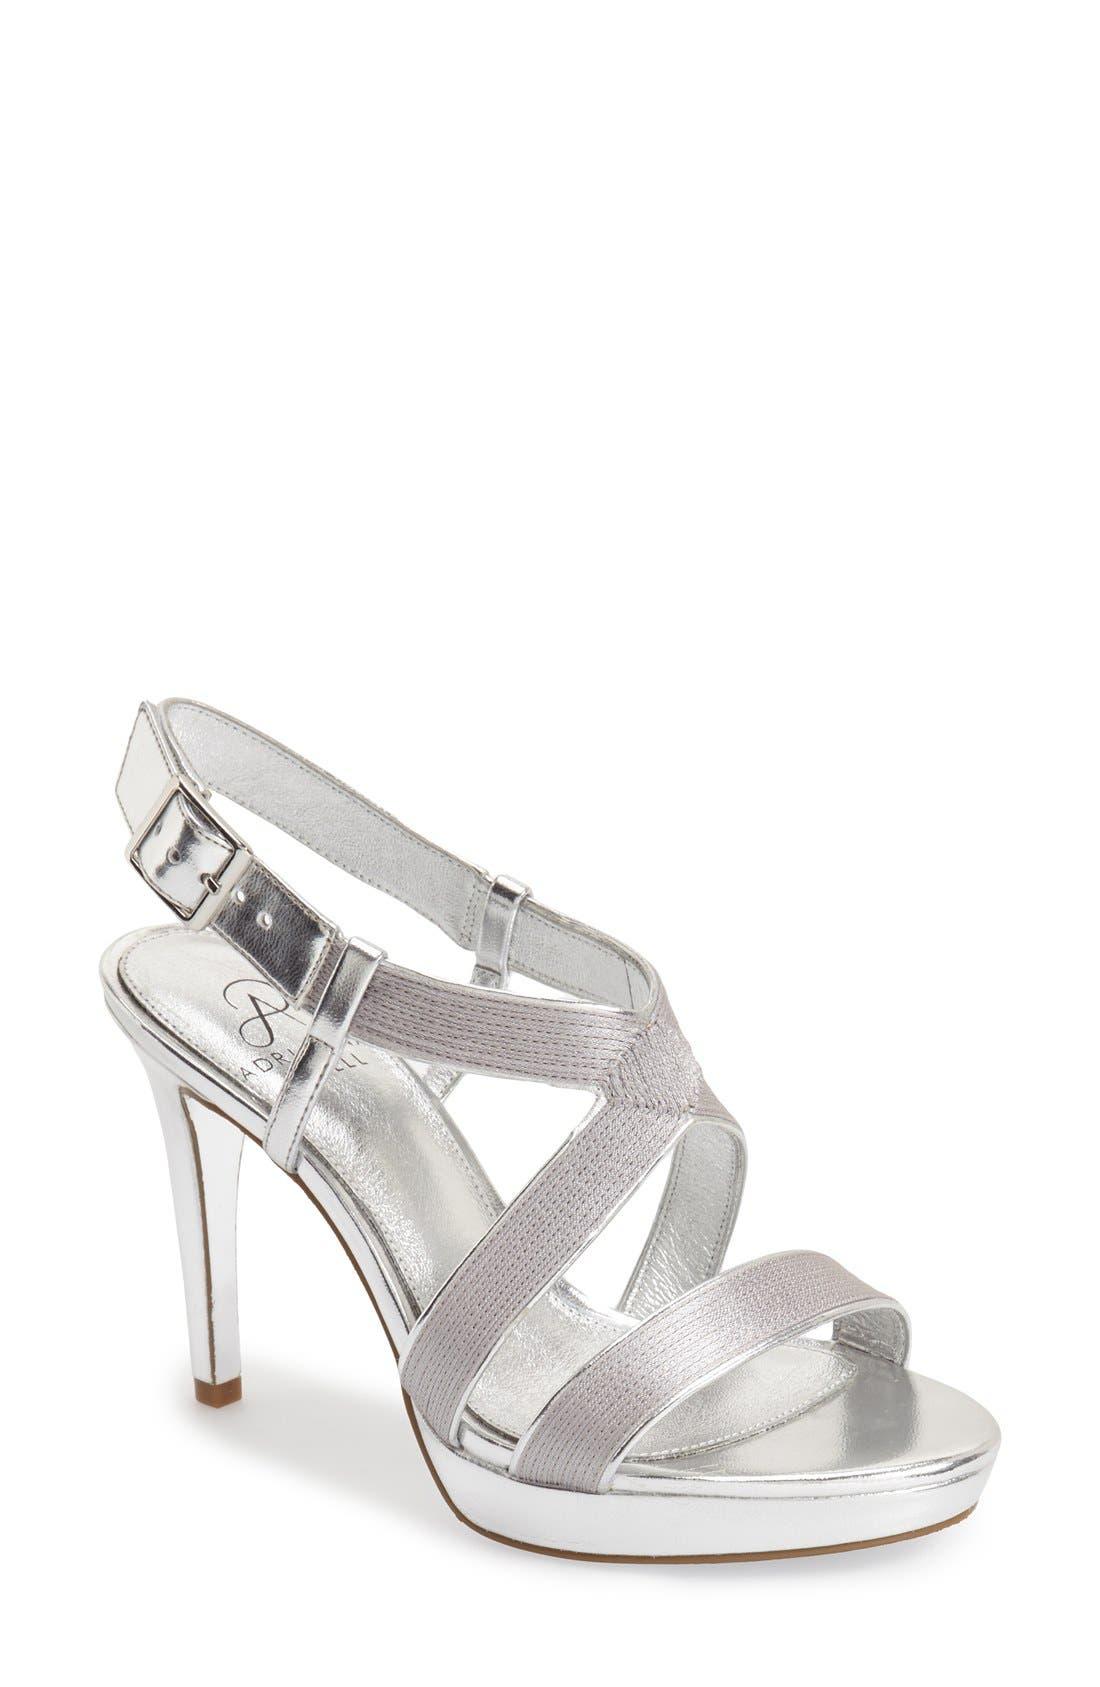 Alternate Image 1 Selected - Adrianna Papell 'Anette' Platform Sandal (Women)